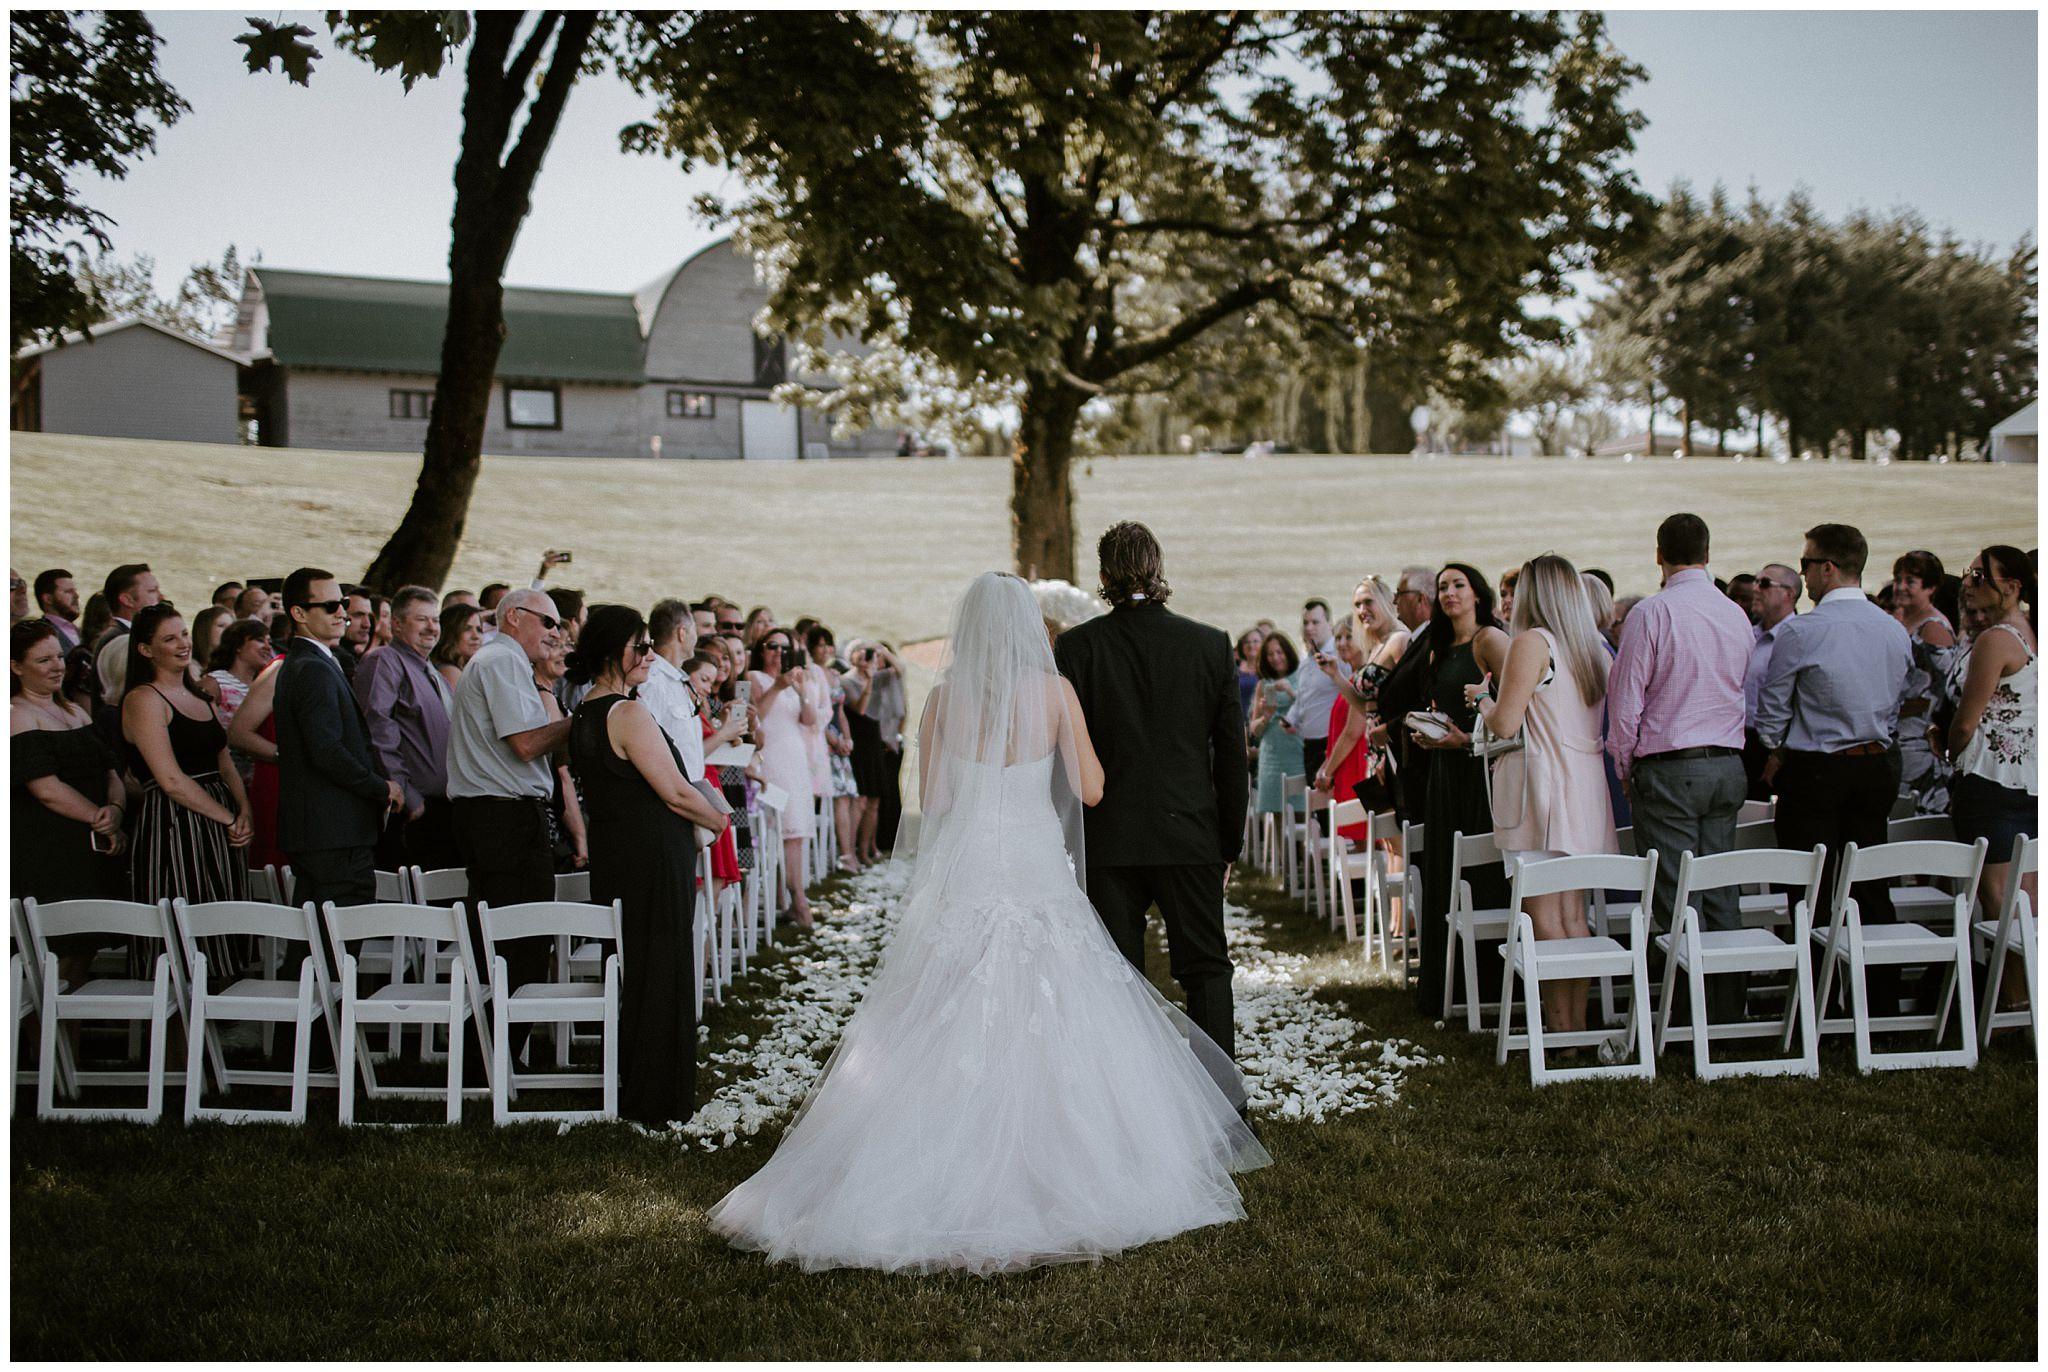 mt-lehman-winery-wedding-abbotsford-21.JPG